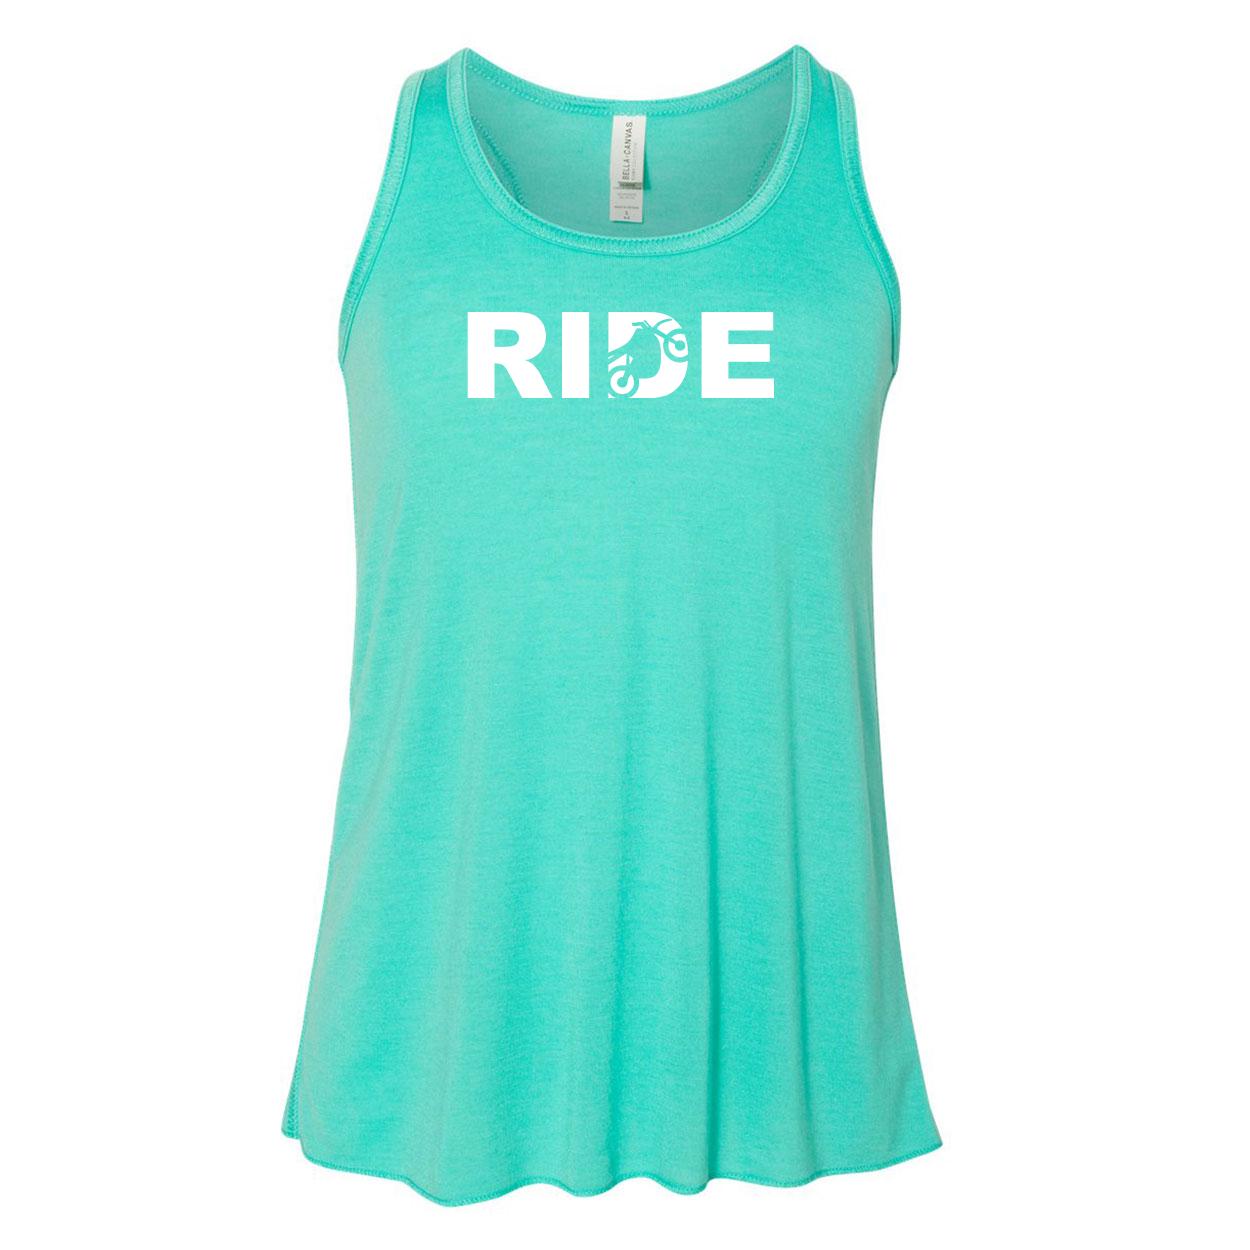 Ride Moto Logo Classic Youth Girls Flowy Racerback Tank Top Teal (White Logo)